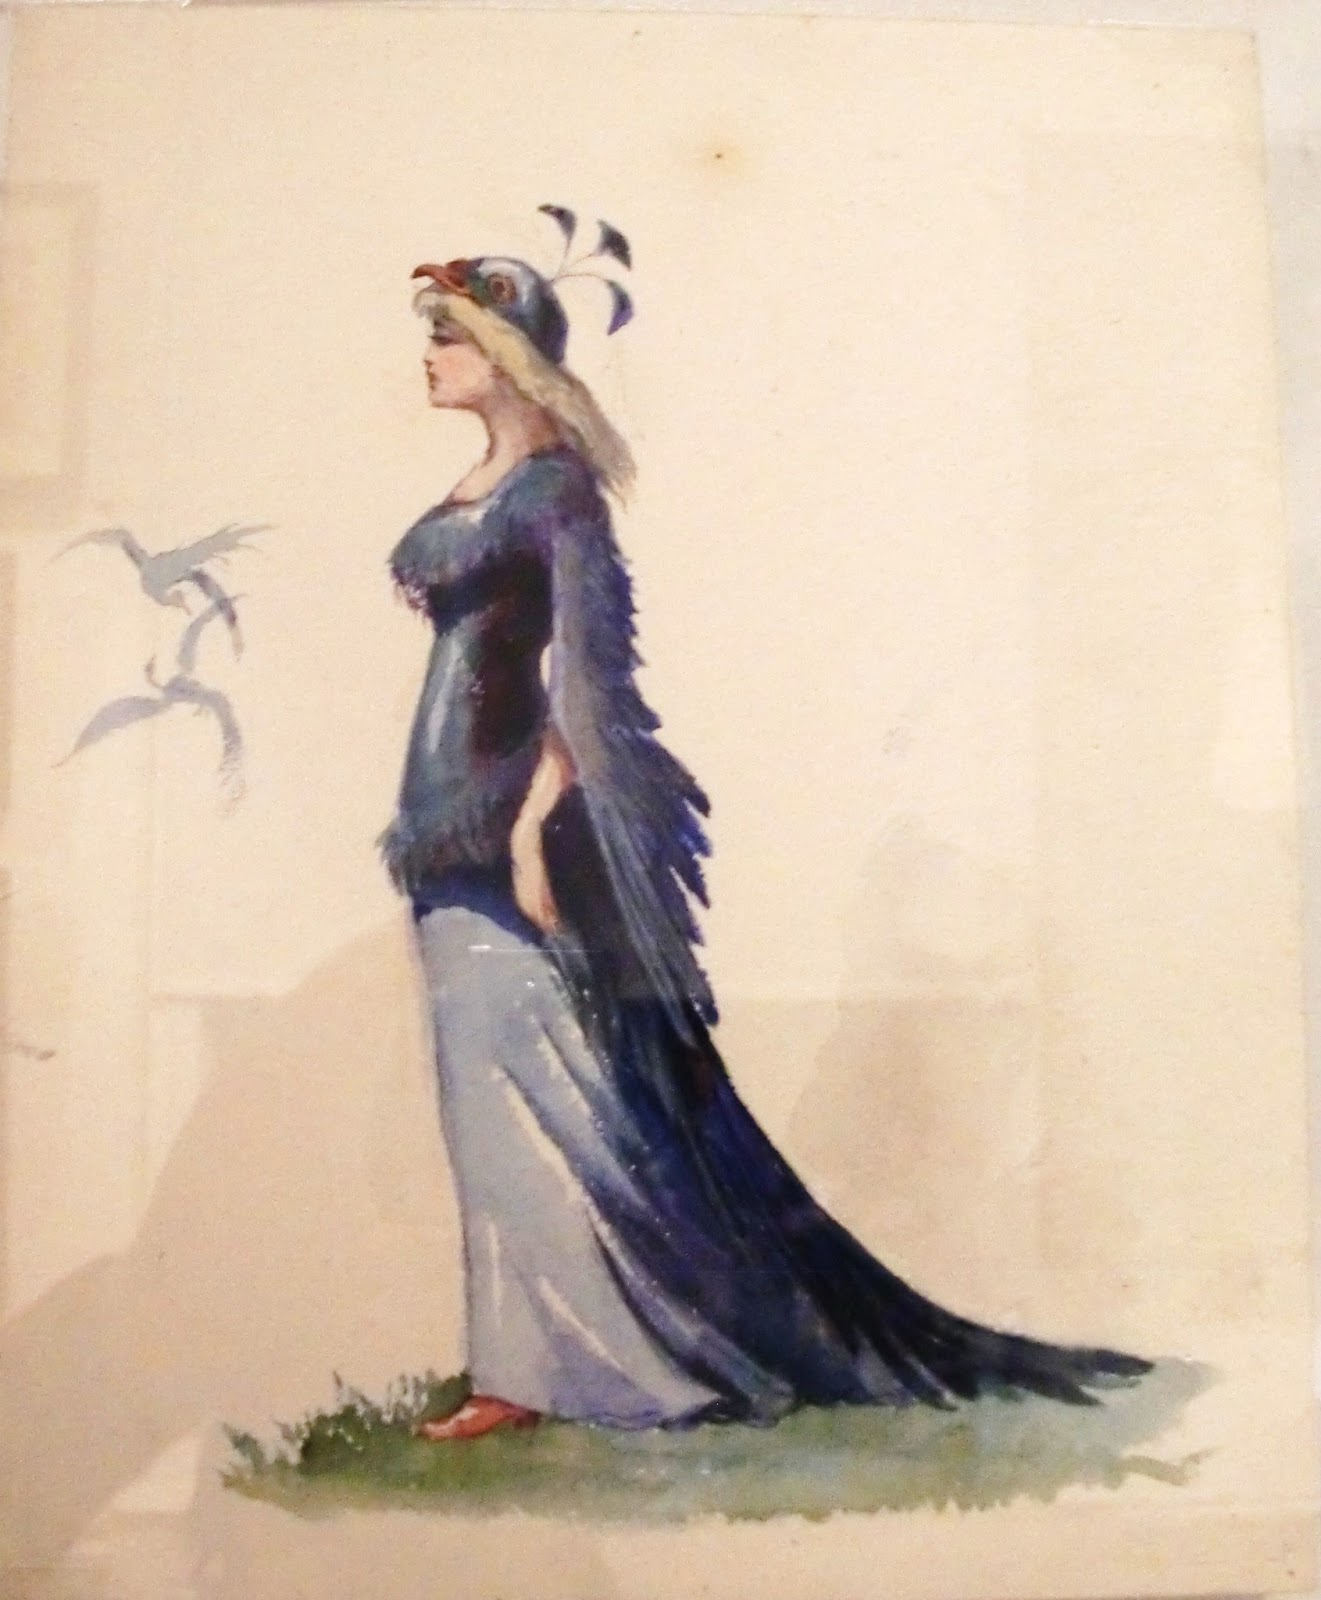 Russian Bird Woman Bird Woman Costume Sketch by